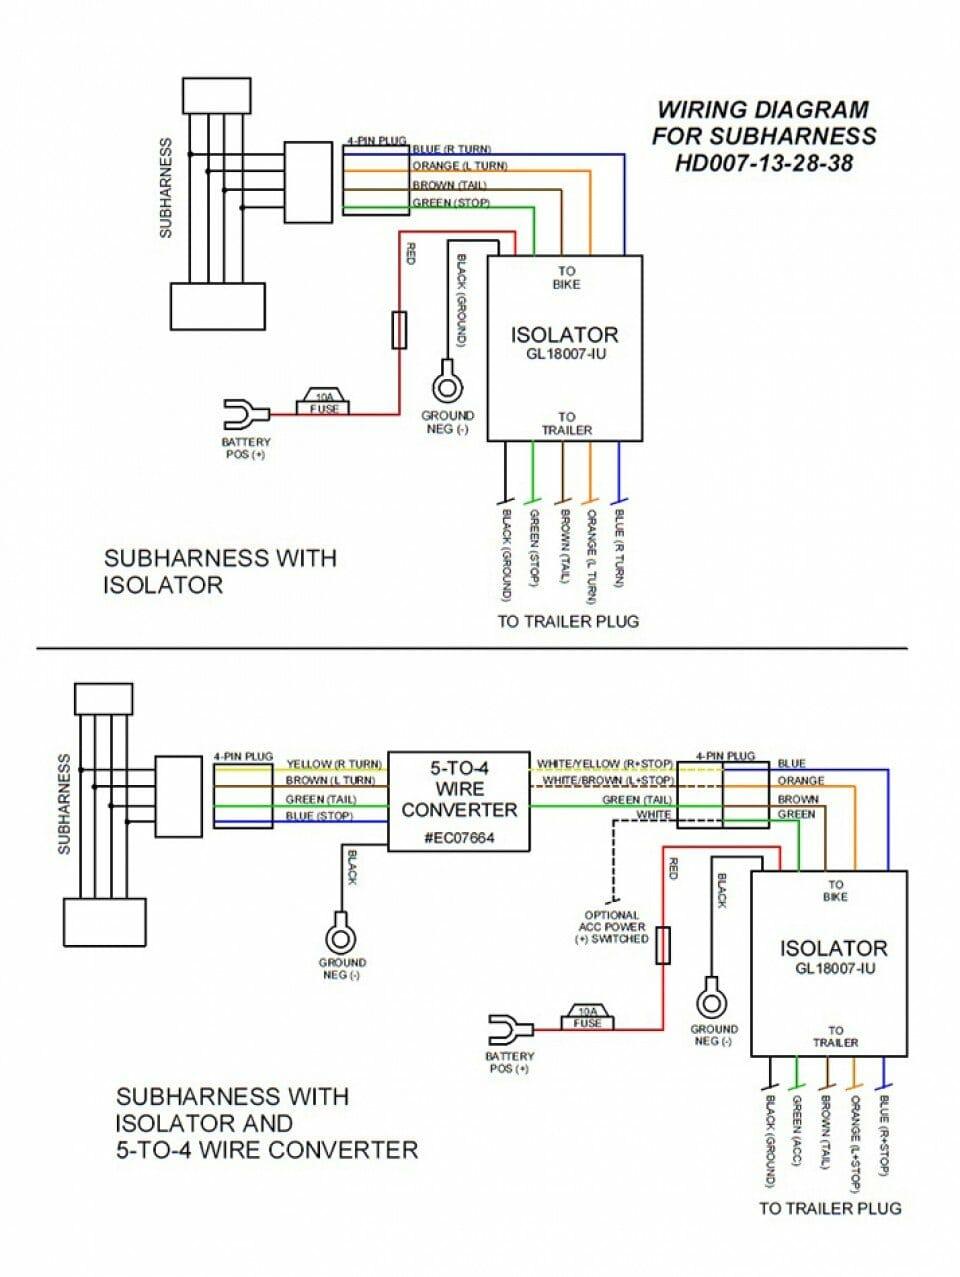 medium resolution of hd007 28 wiring diagram ps web 1